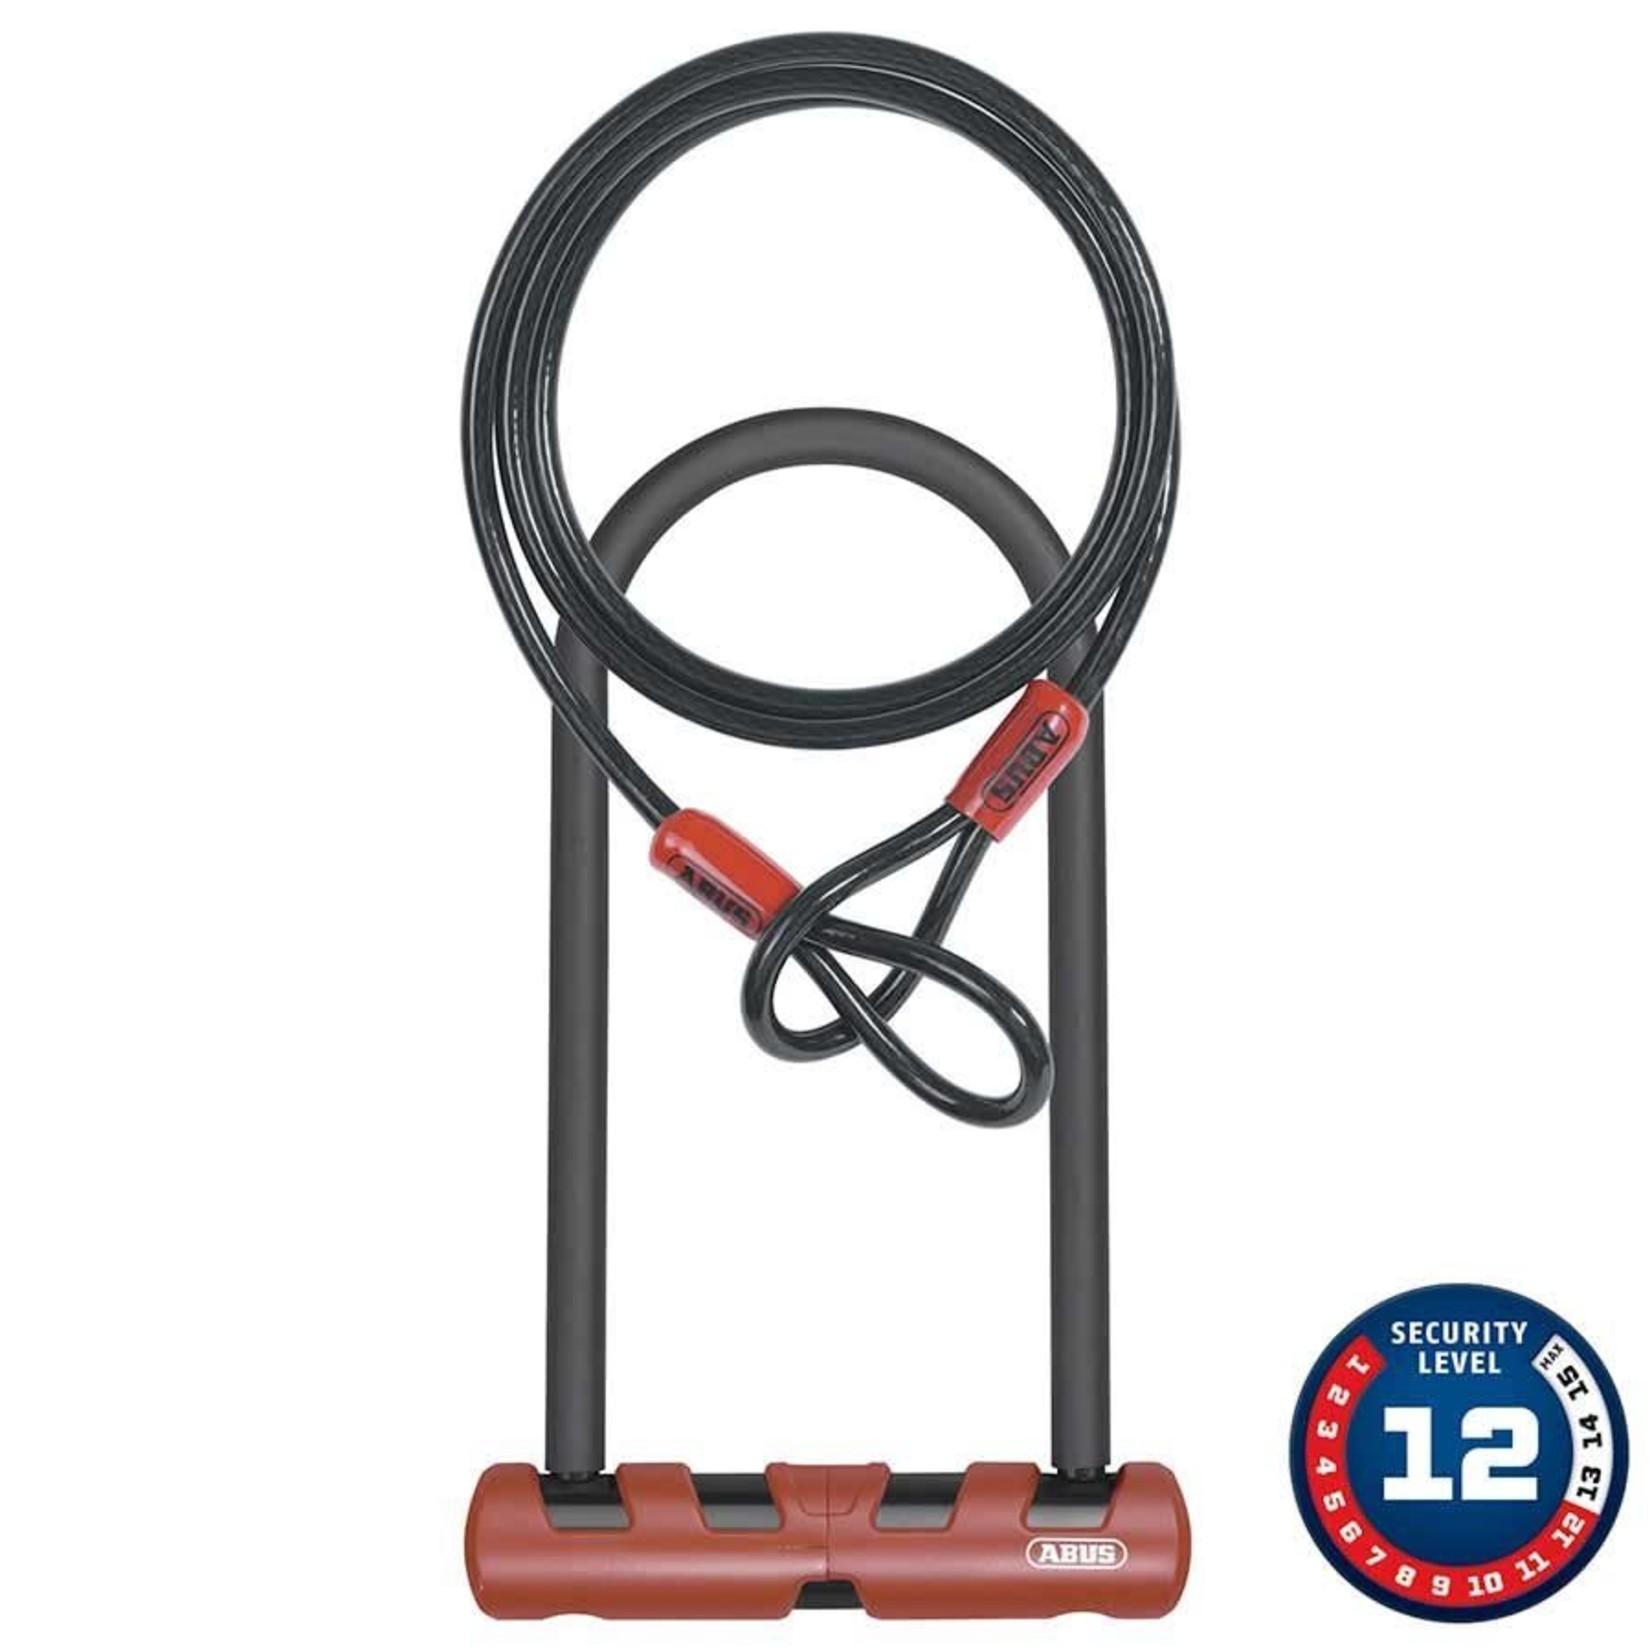 Abus Abus Ultimate 420 U-Lock w/ cable